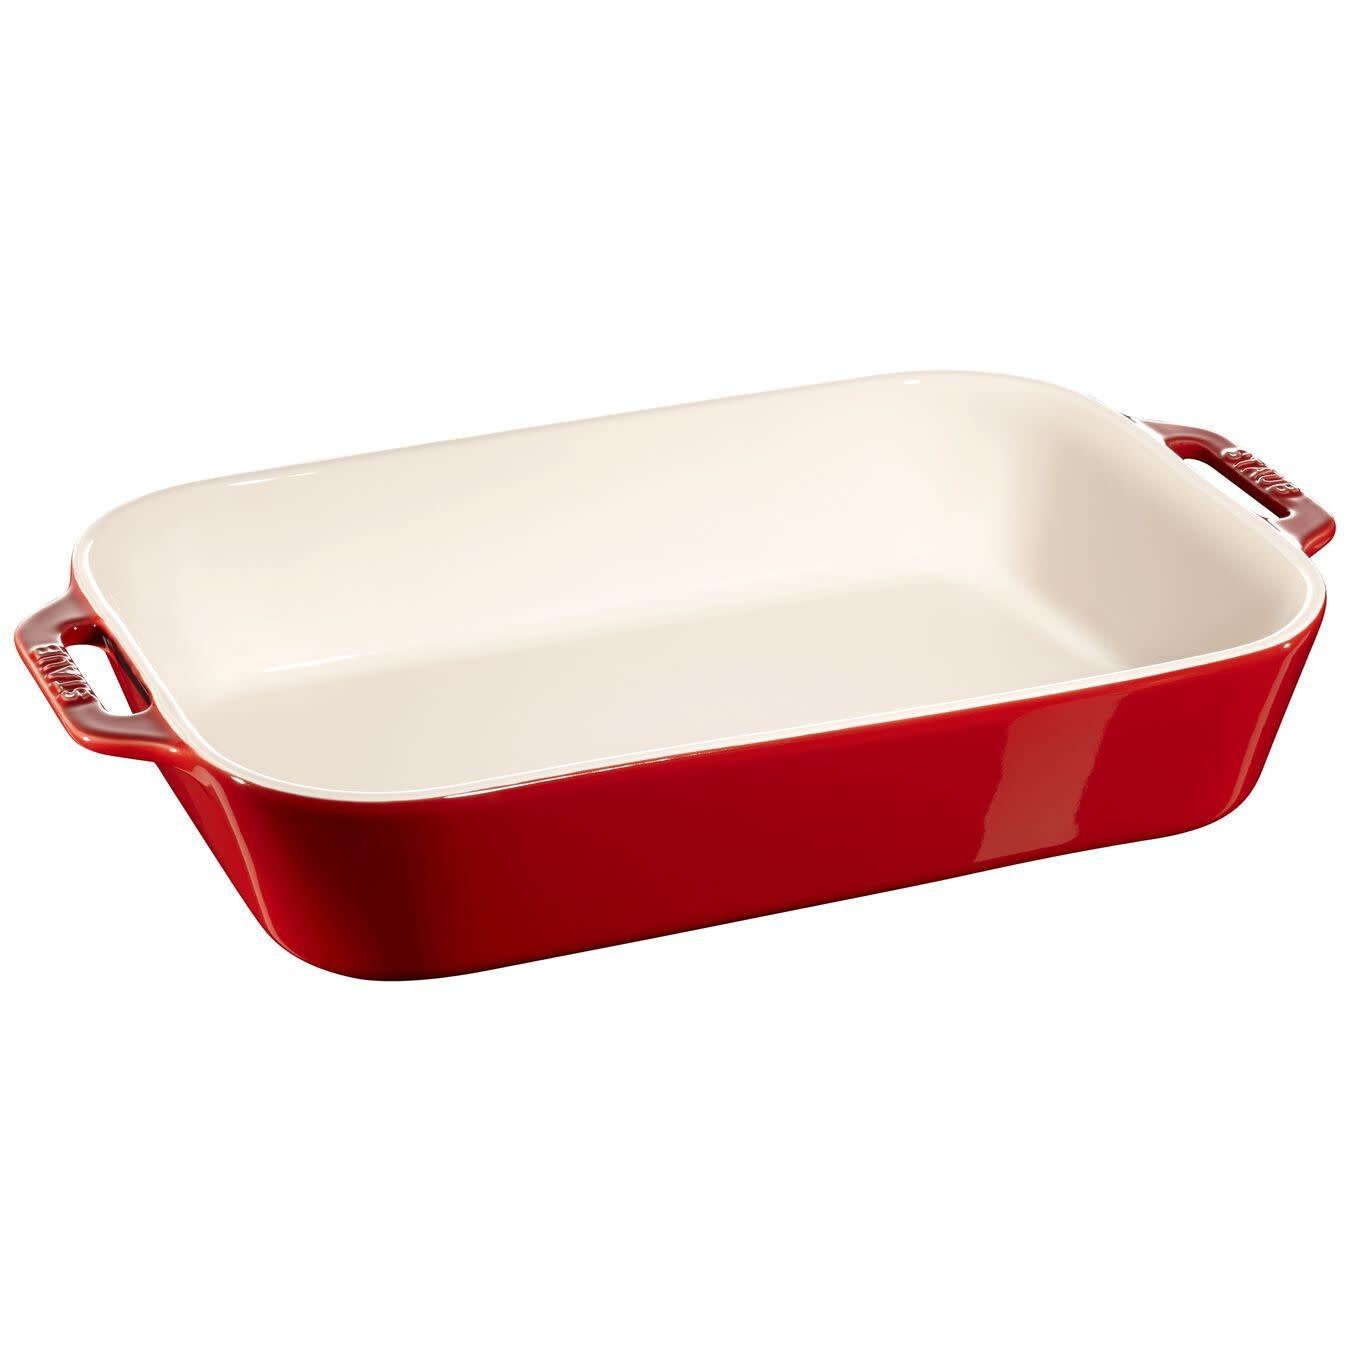 "Staub Rectangular Baking Dish Red 34x24cm /13""x9"""